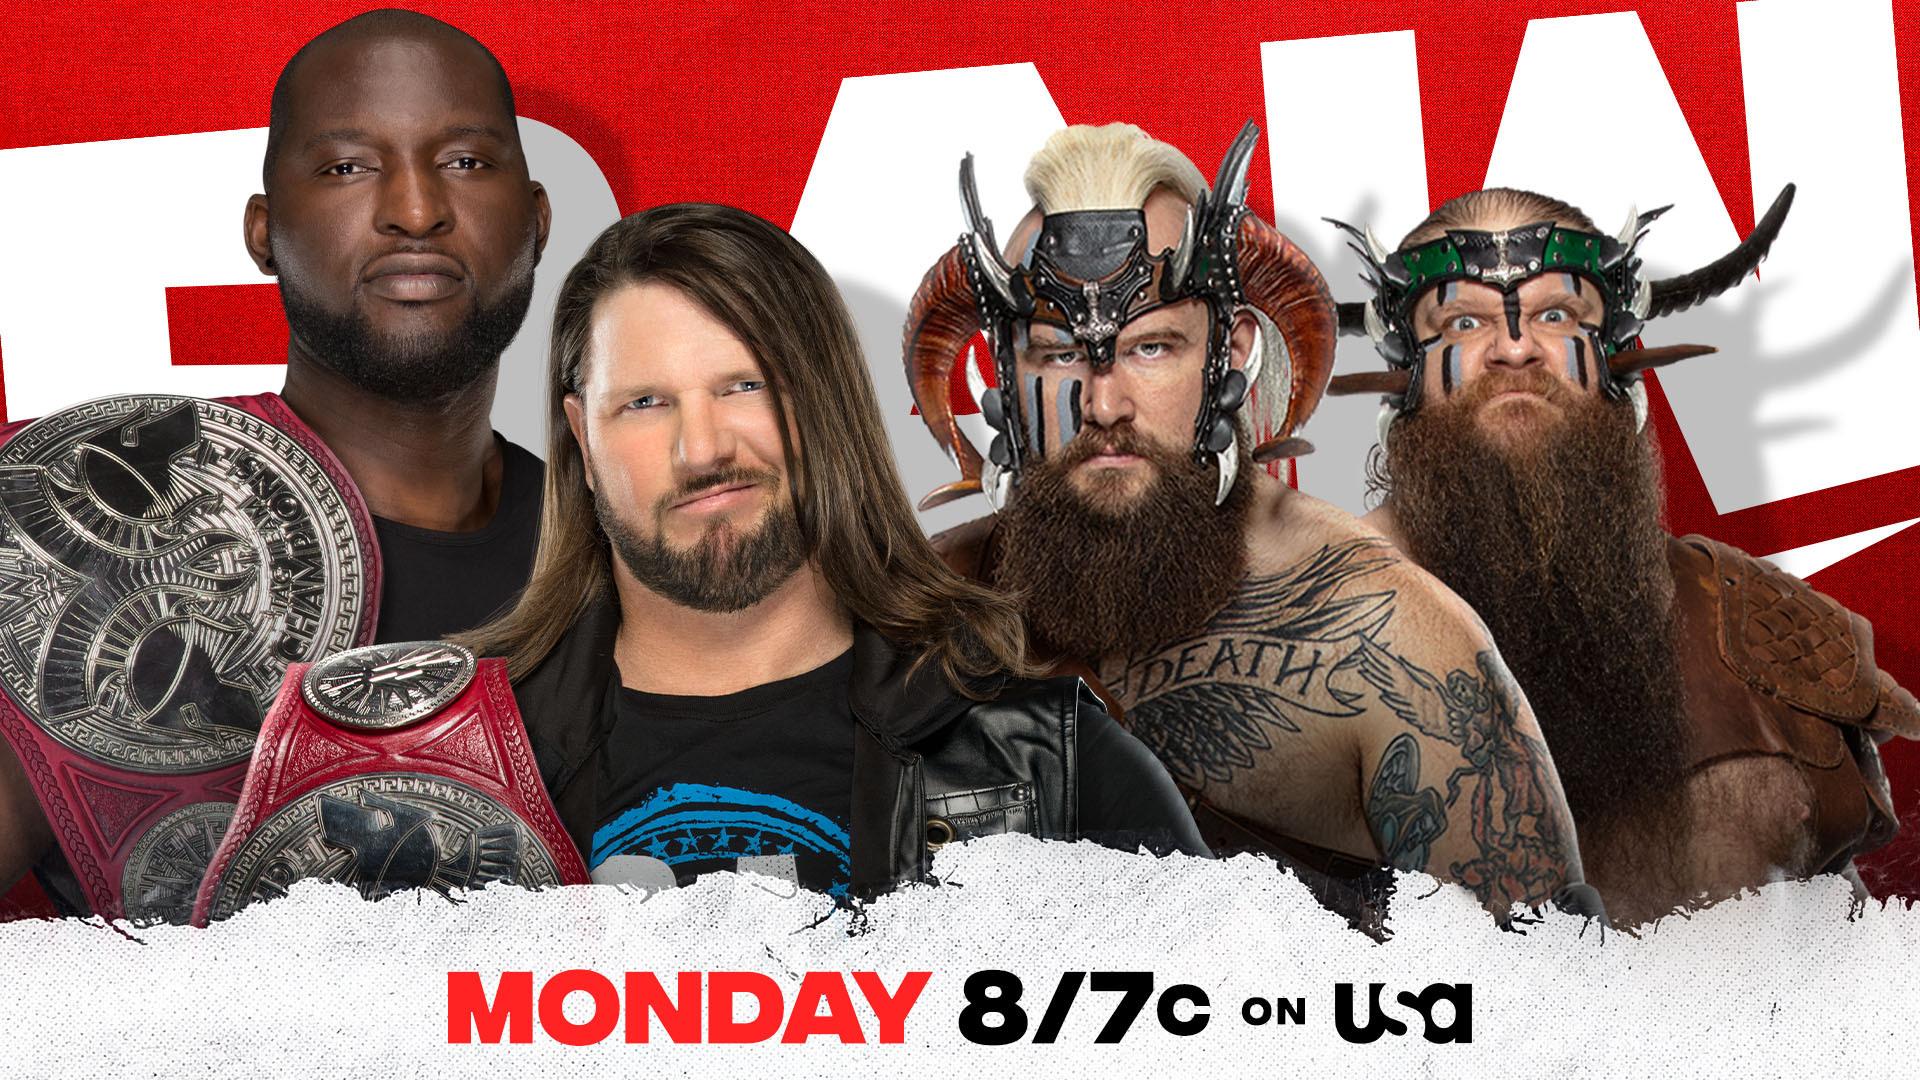 WWE Raw Preview (26/07/21): Bobby Lashley Responds; Championship Win Celebration 24